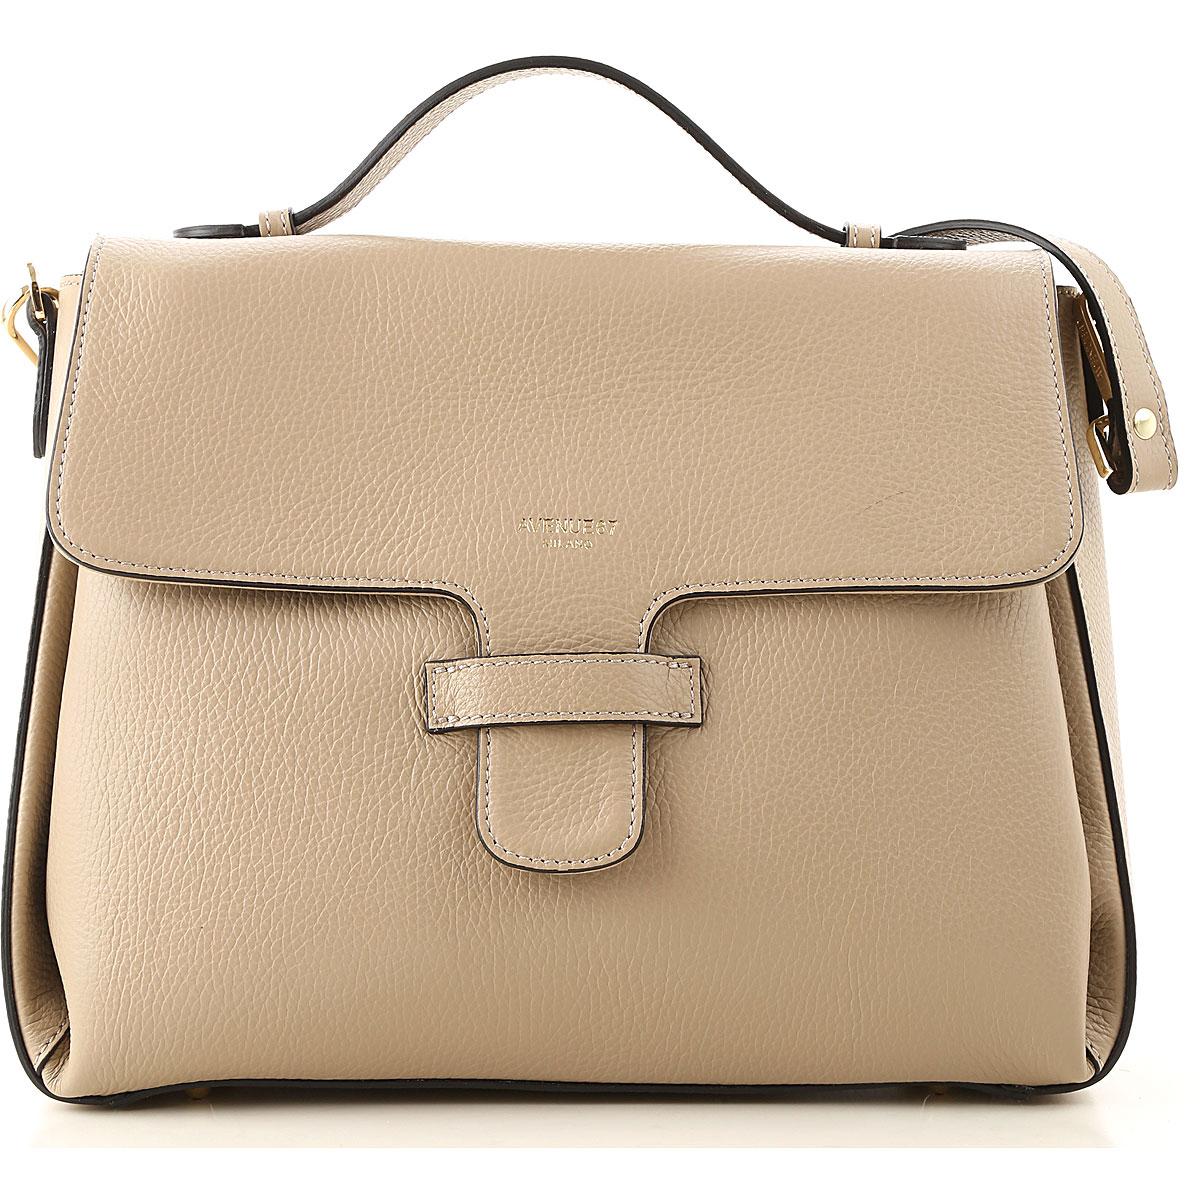 Avenue 67 Shoulder Bag for Women On Sale, Dove Brown, Leather, 2019